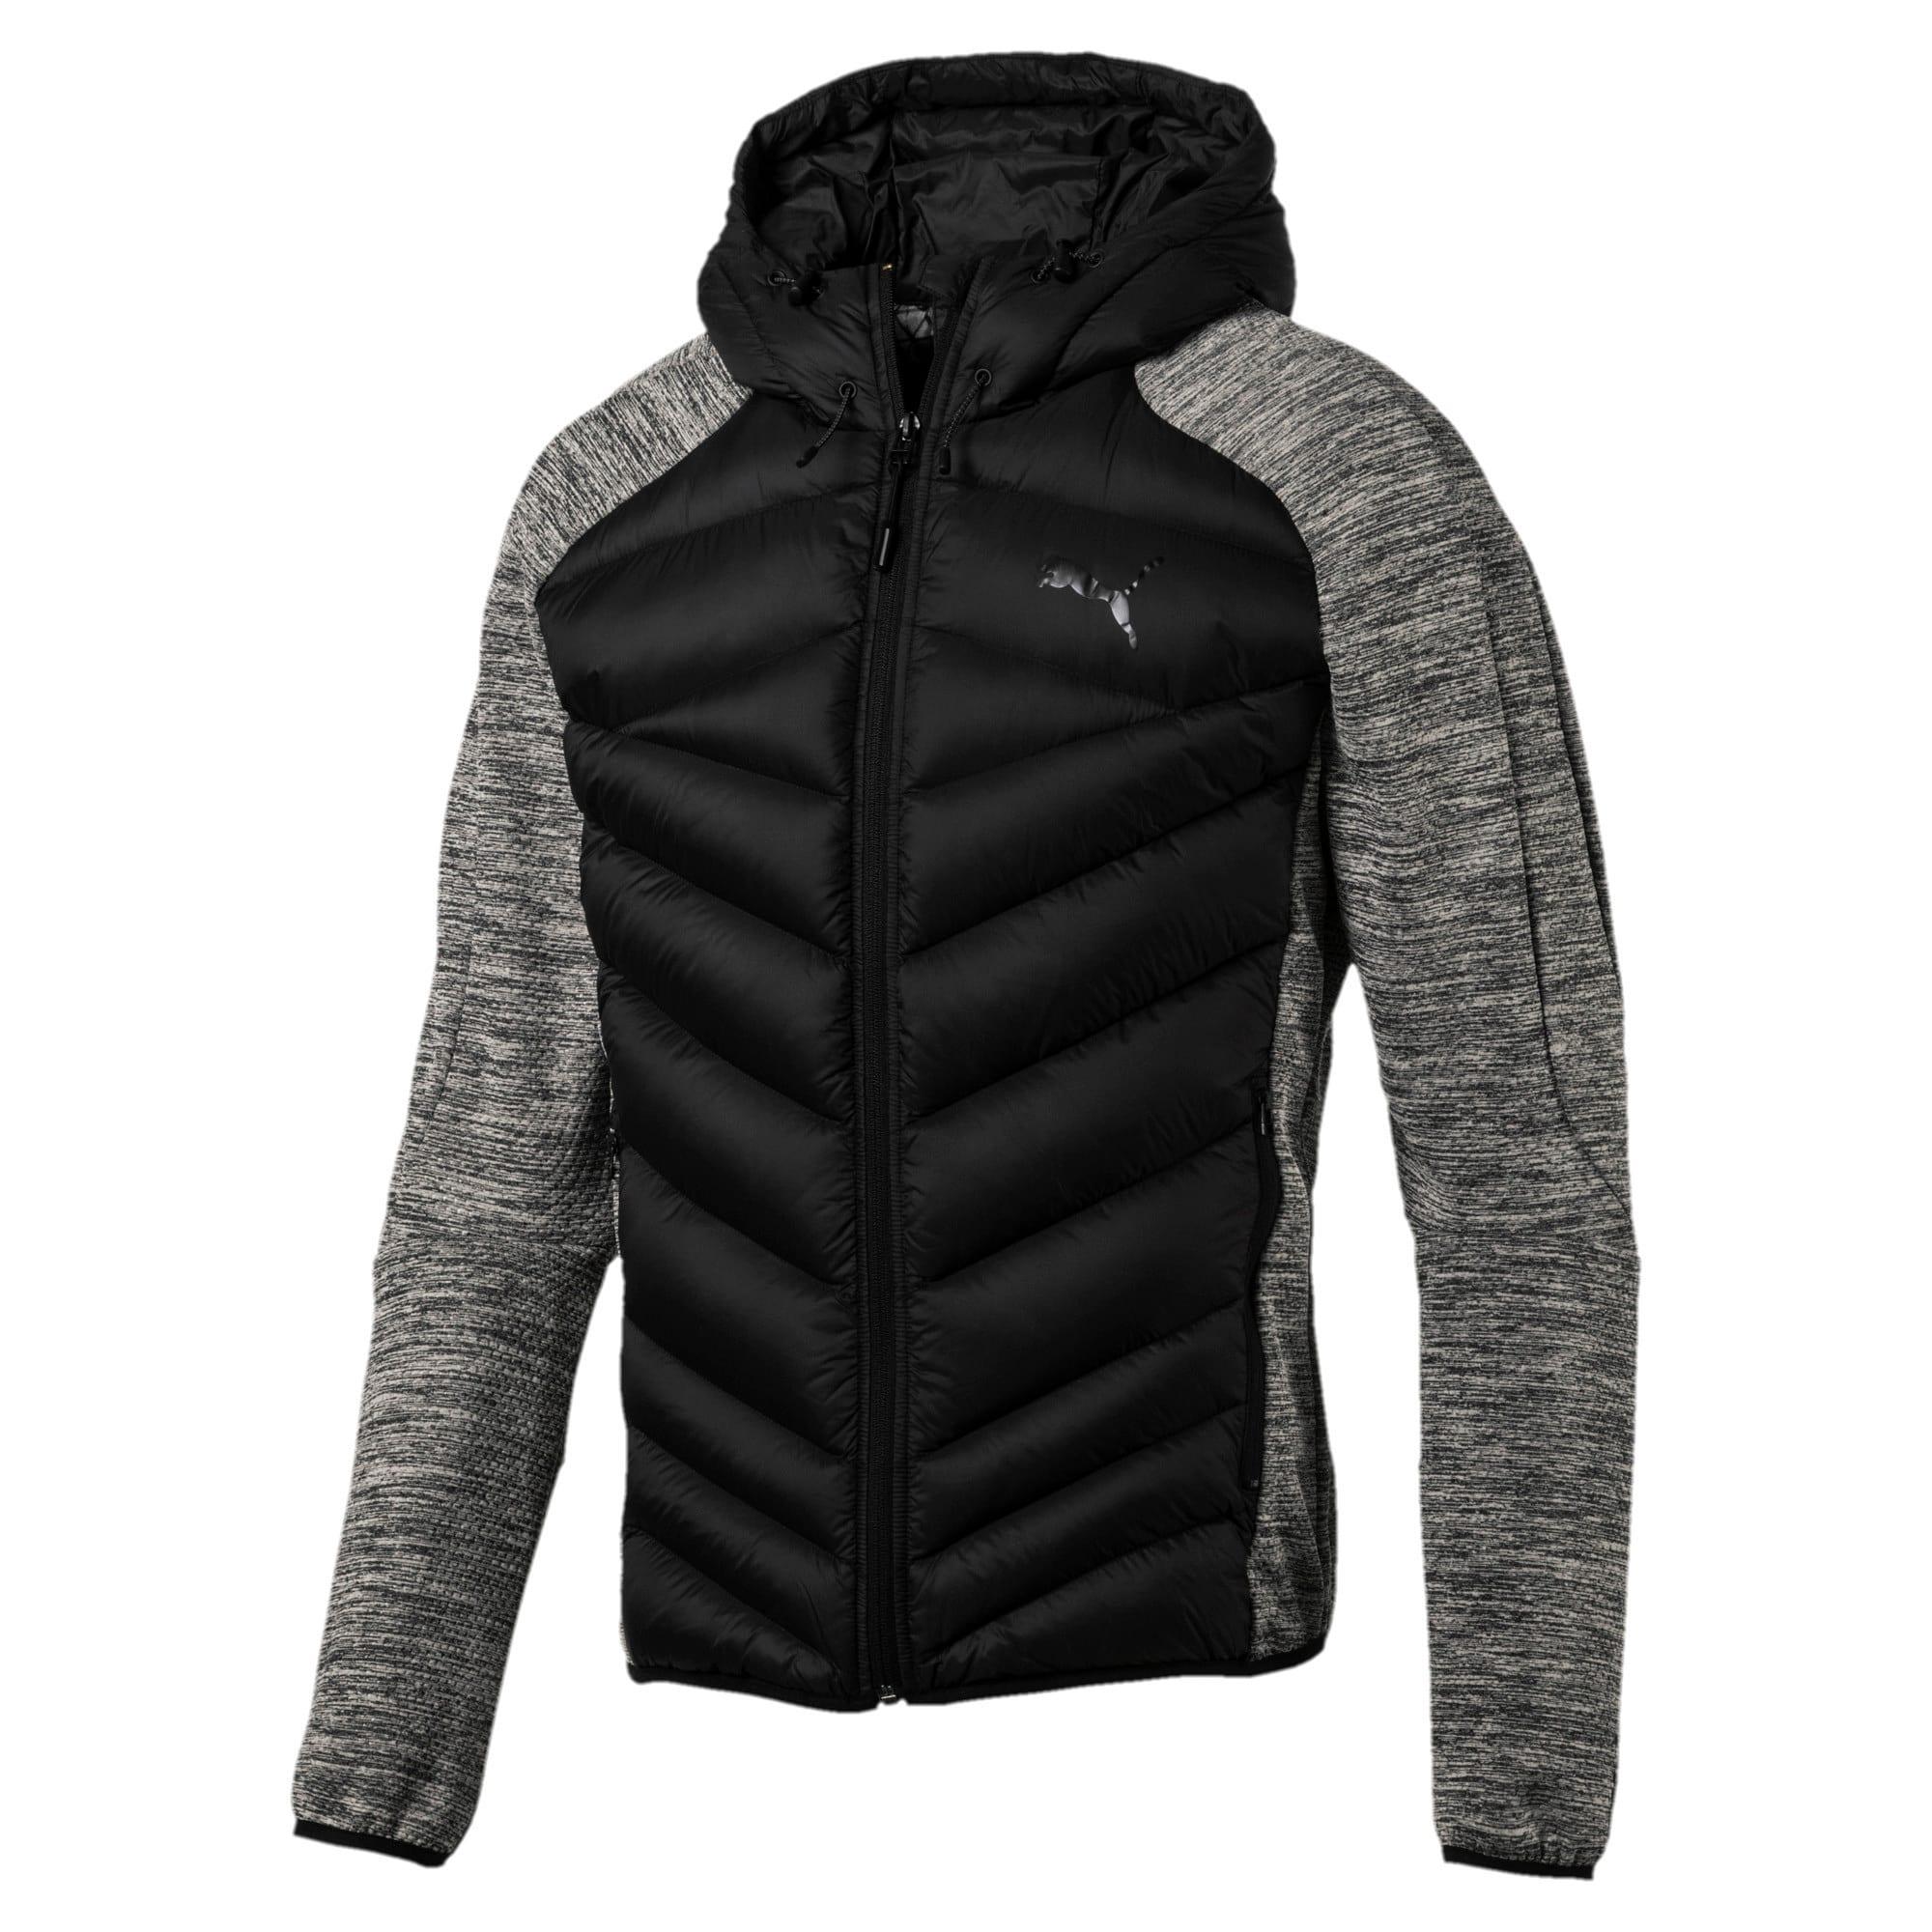 Thumbnail 4 of Double Knit Hybrid 600 Down Men's Jacket, MGH-Puma Black, medium-IND